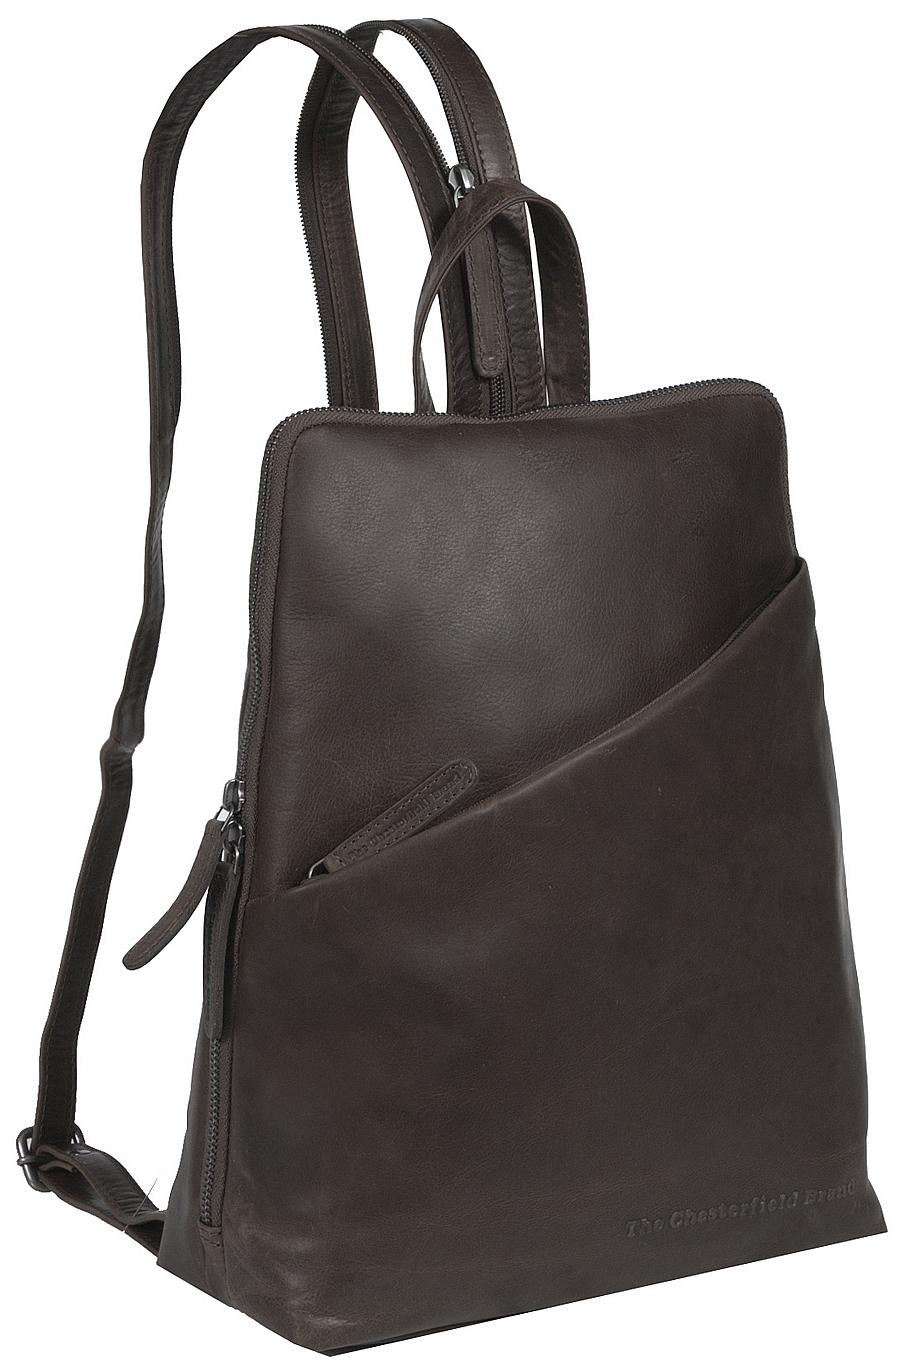 The Chesterfield Brand Dámský kožený batoh do města Bath C58.014701 hnědý